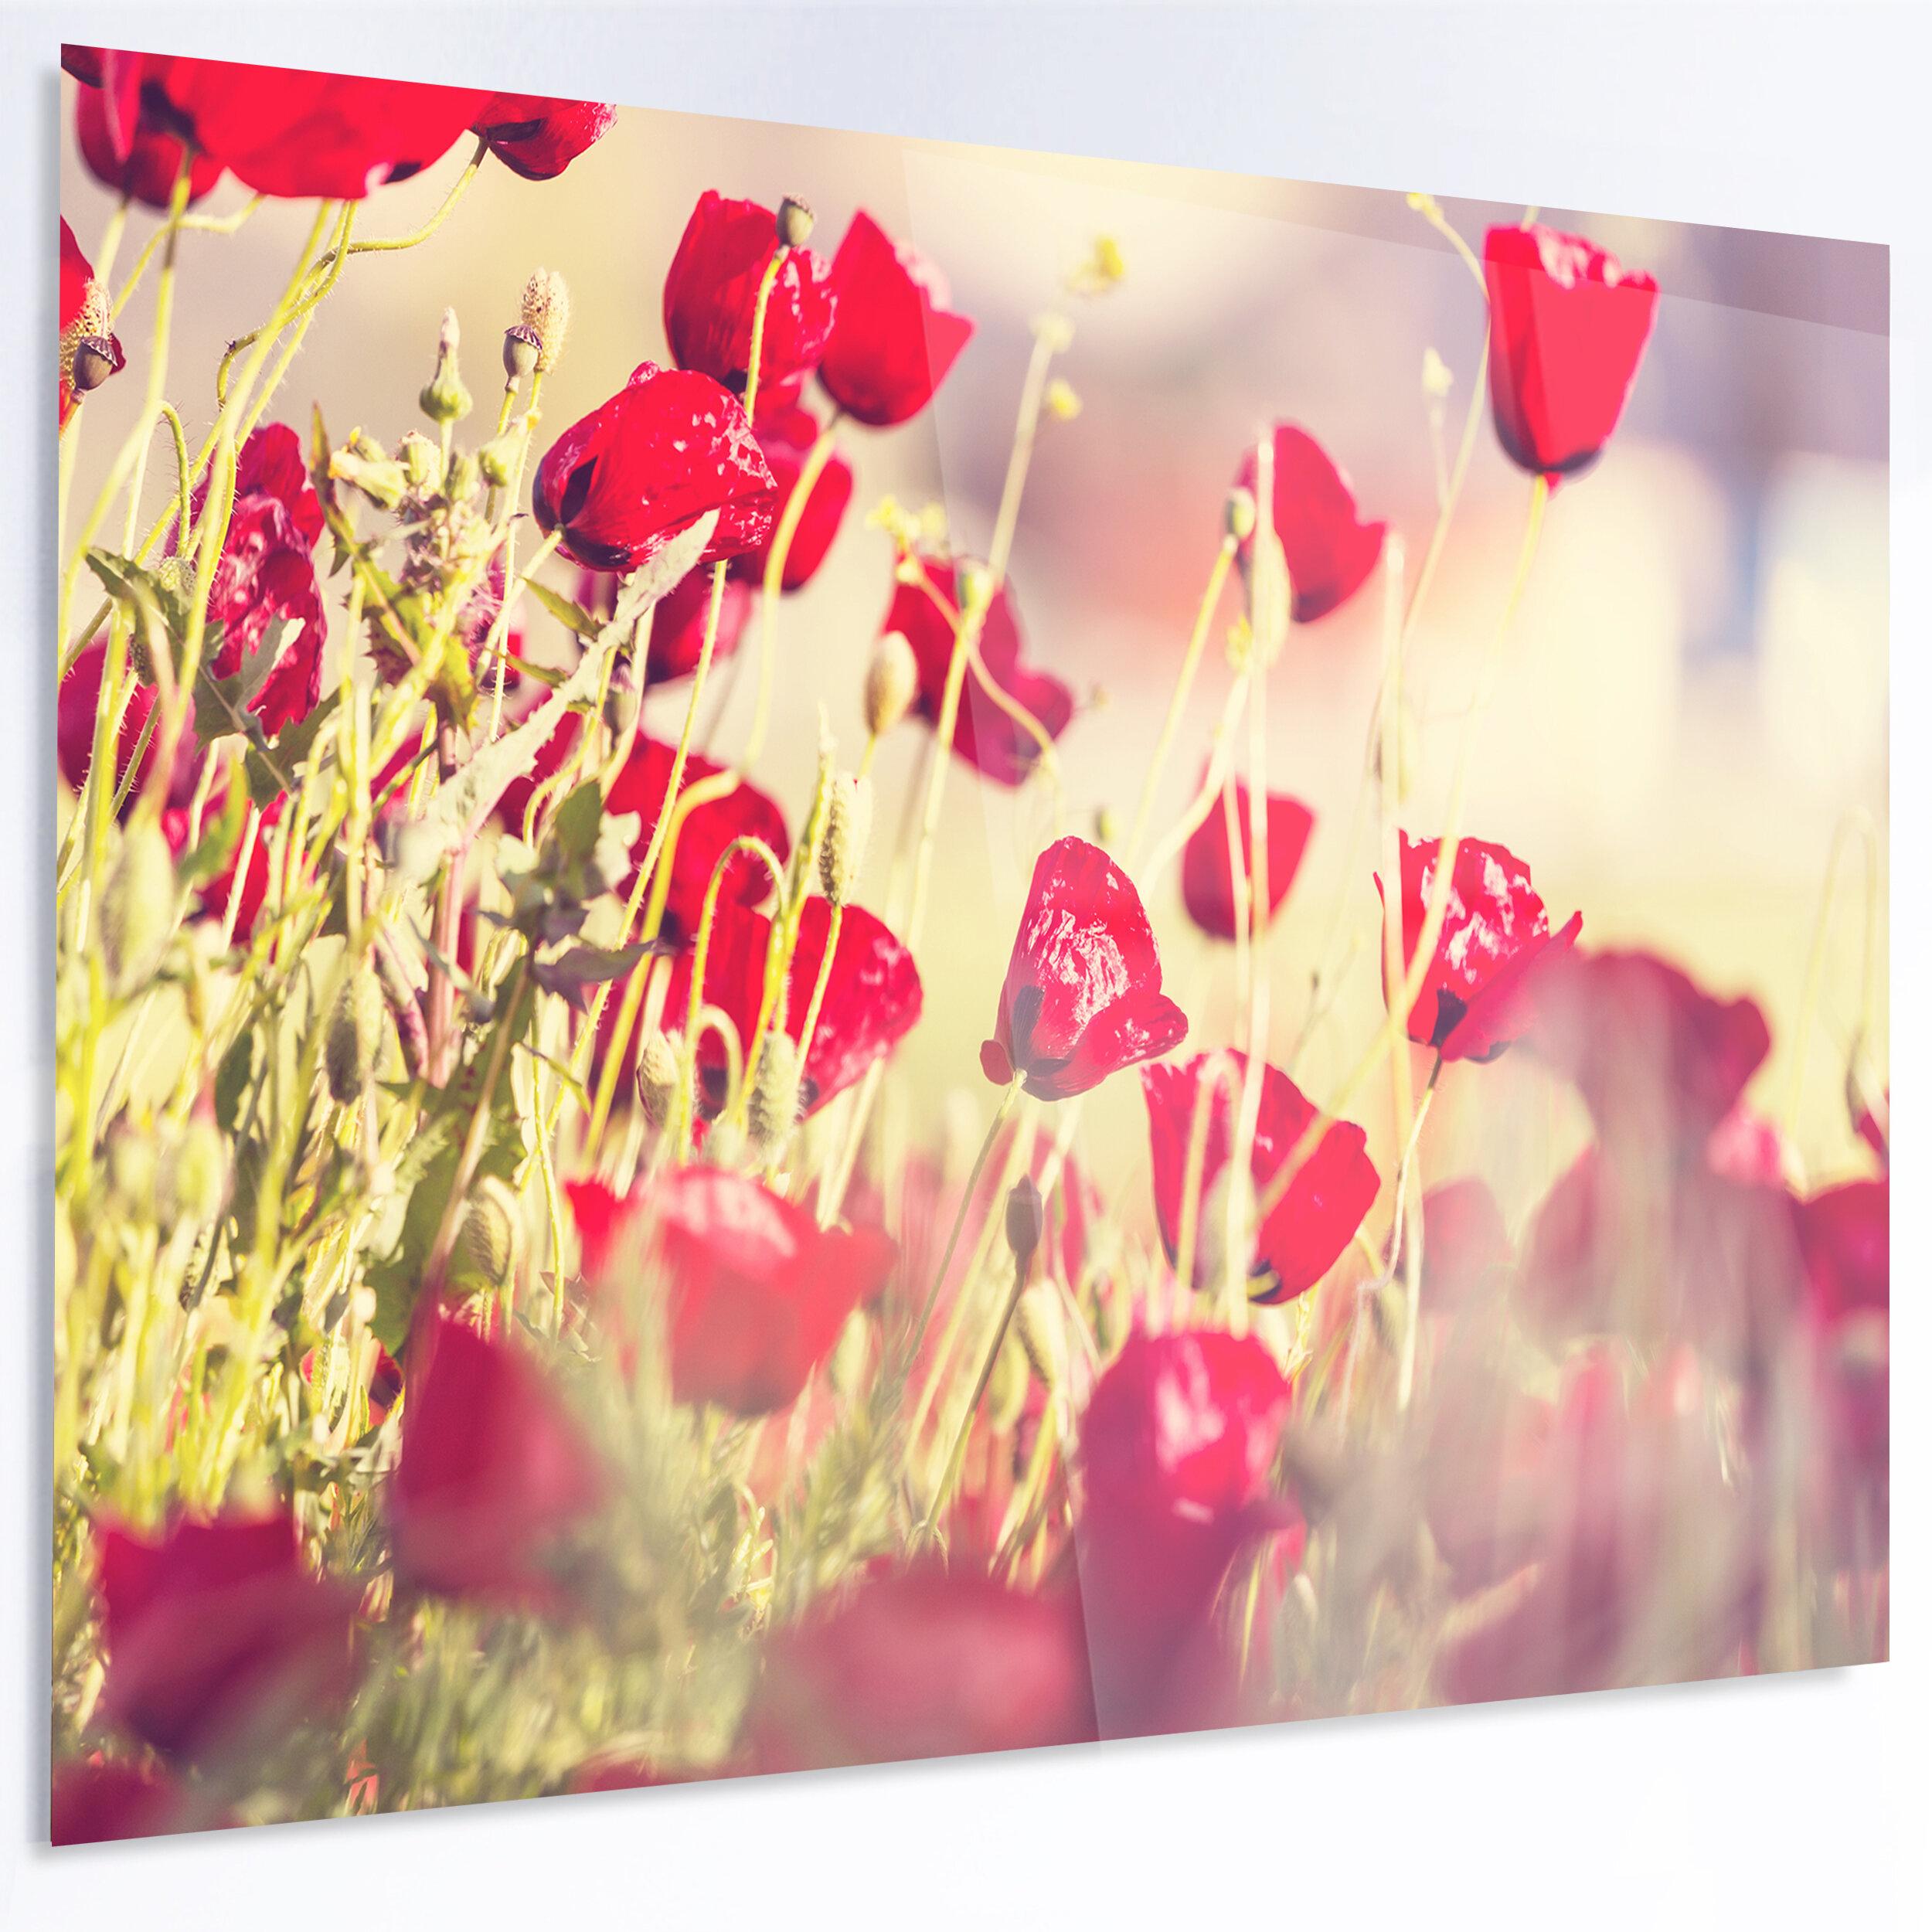 DesignArt \'Poppy Flowers on Light Background\' Photographic Print on ...